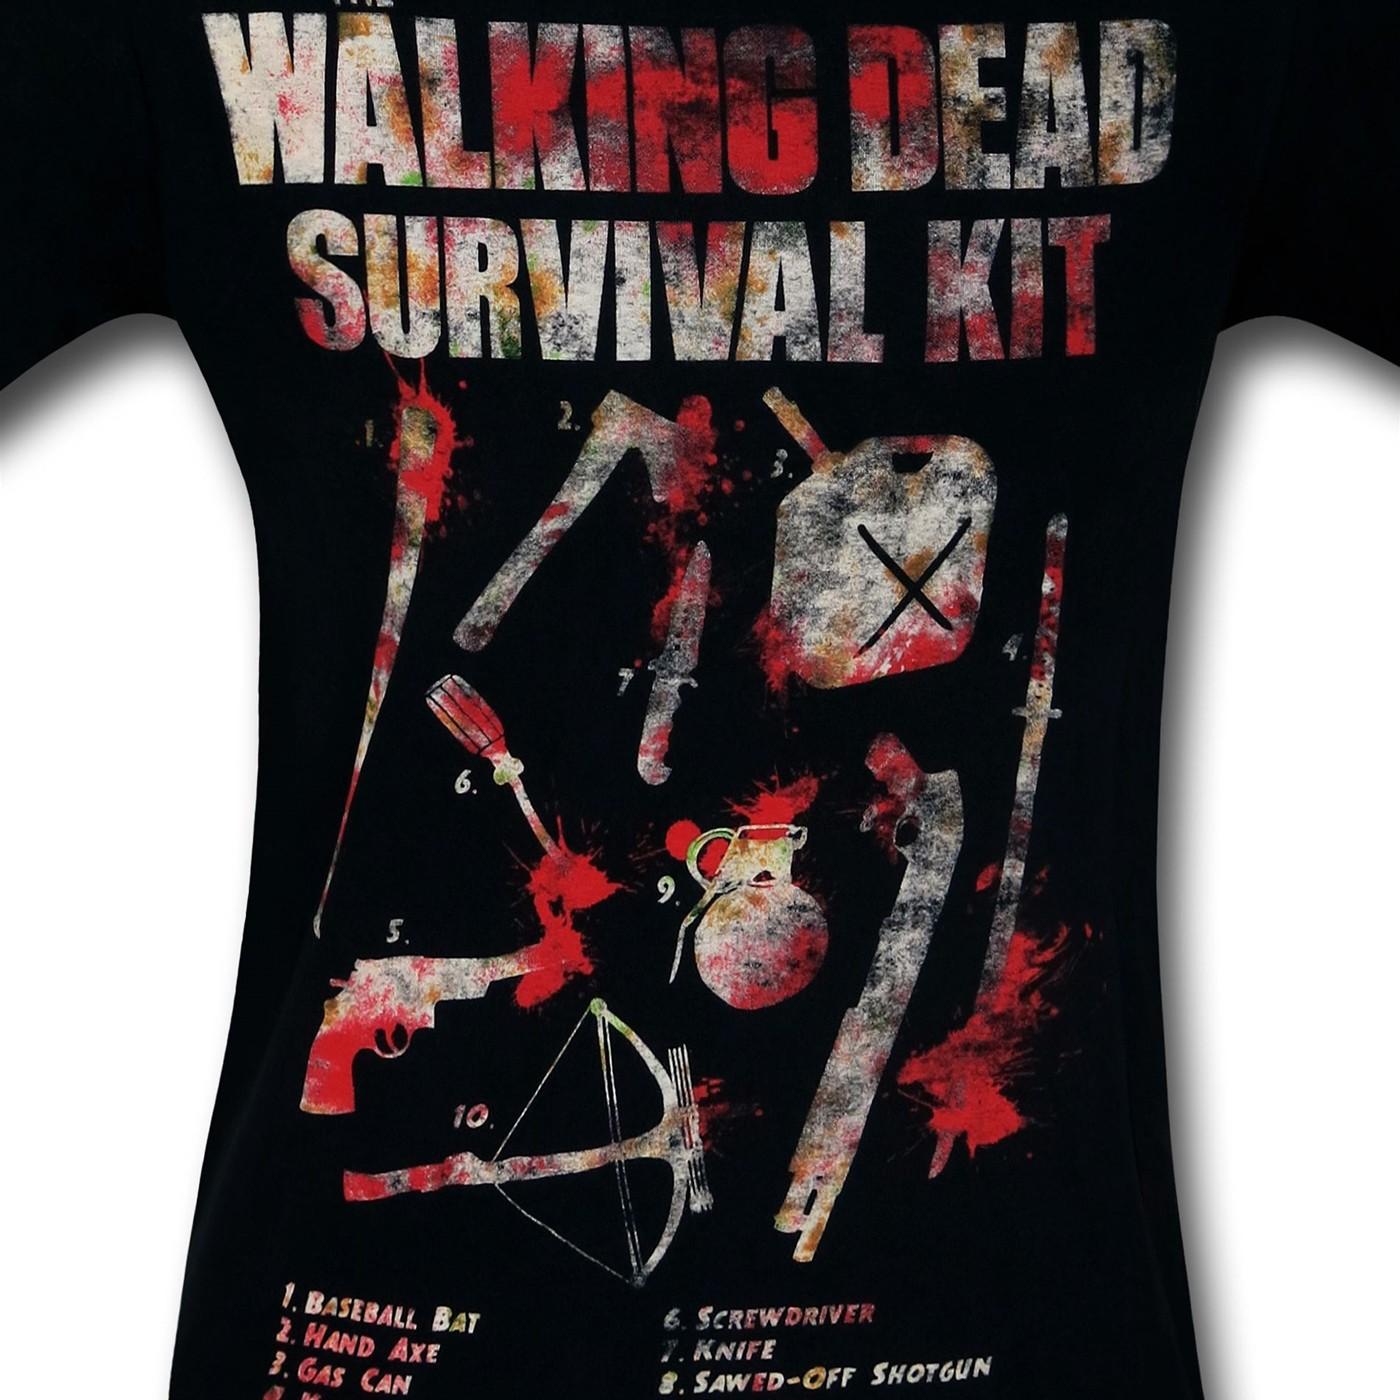 Walking Dead Survival Kit T-Shirt